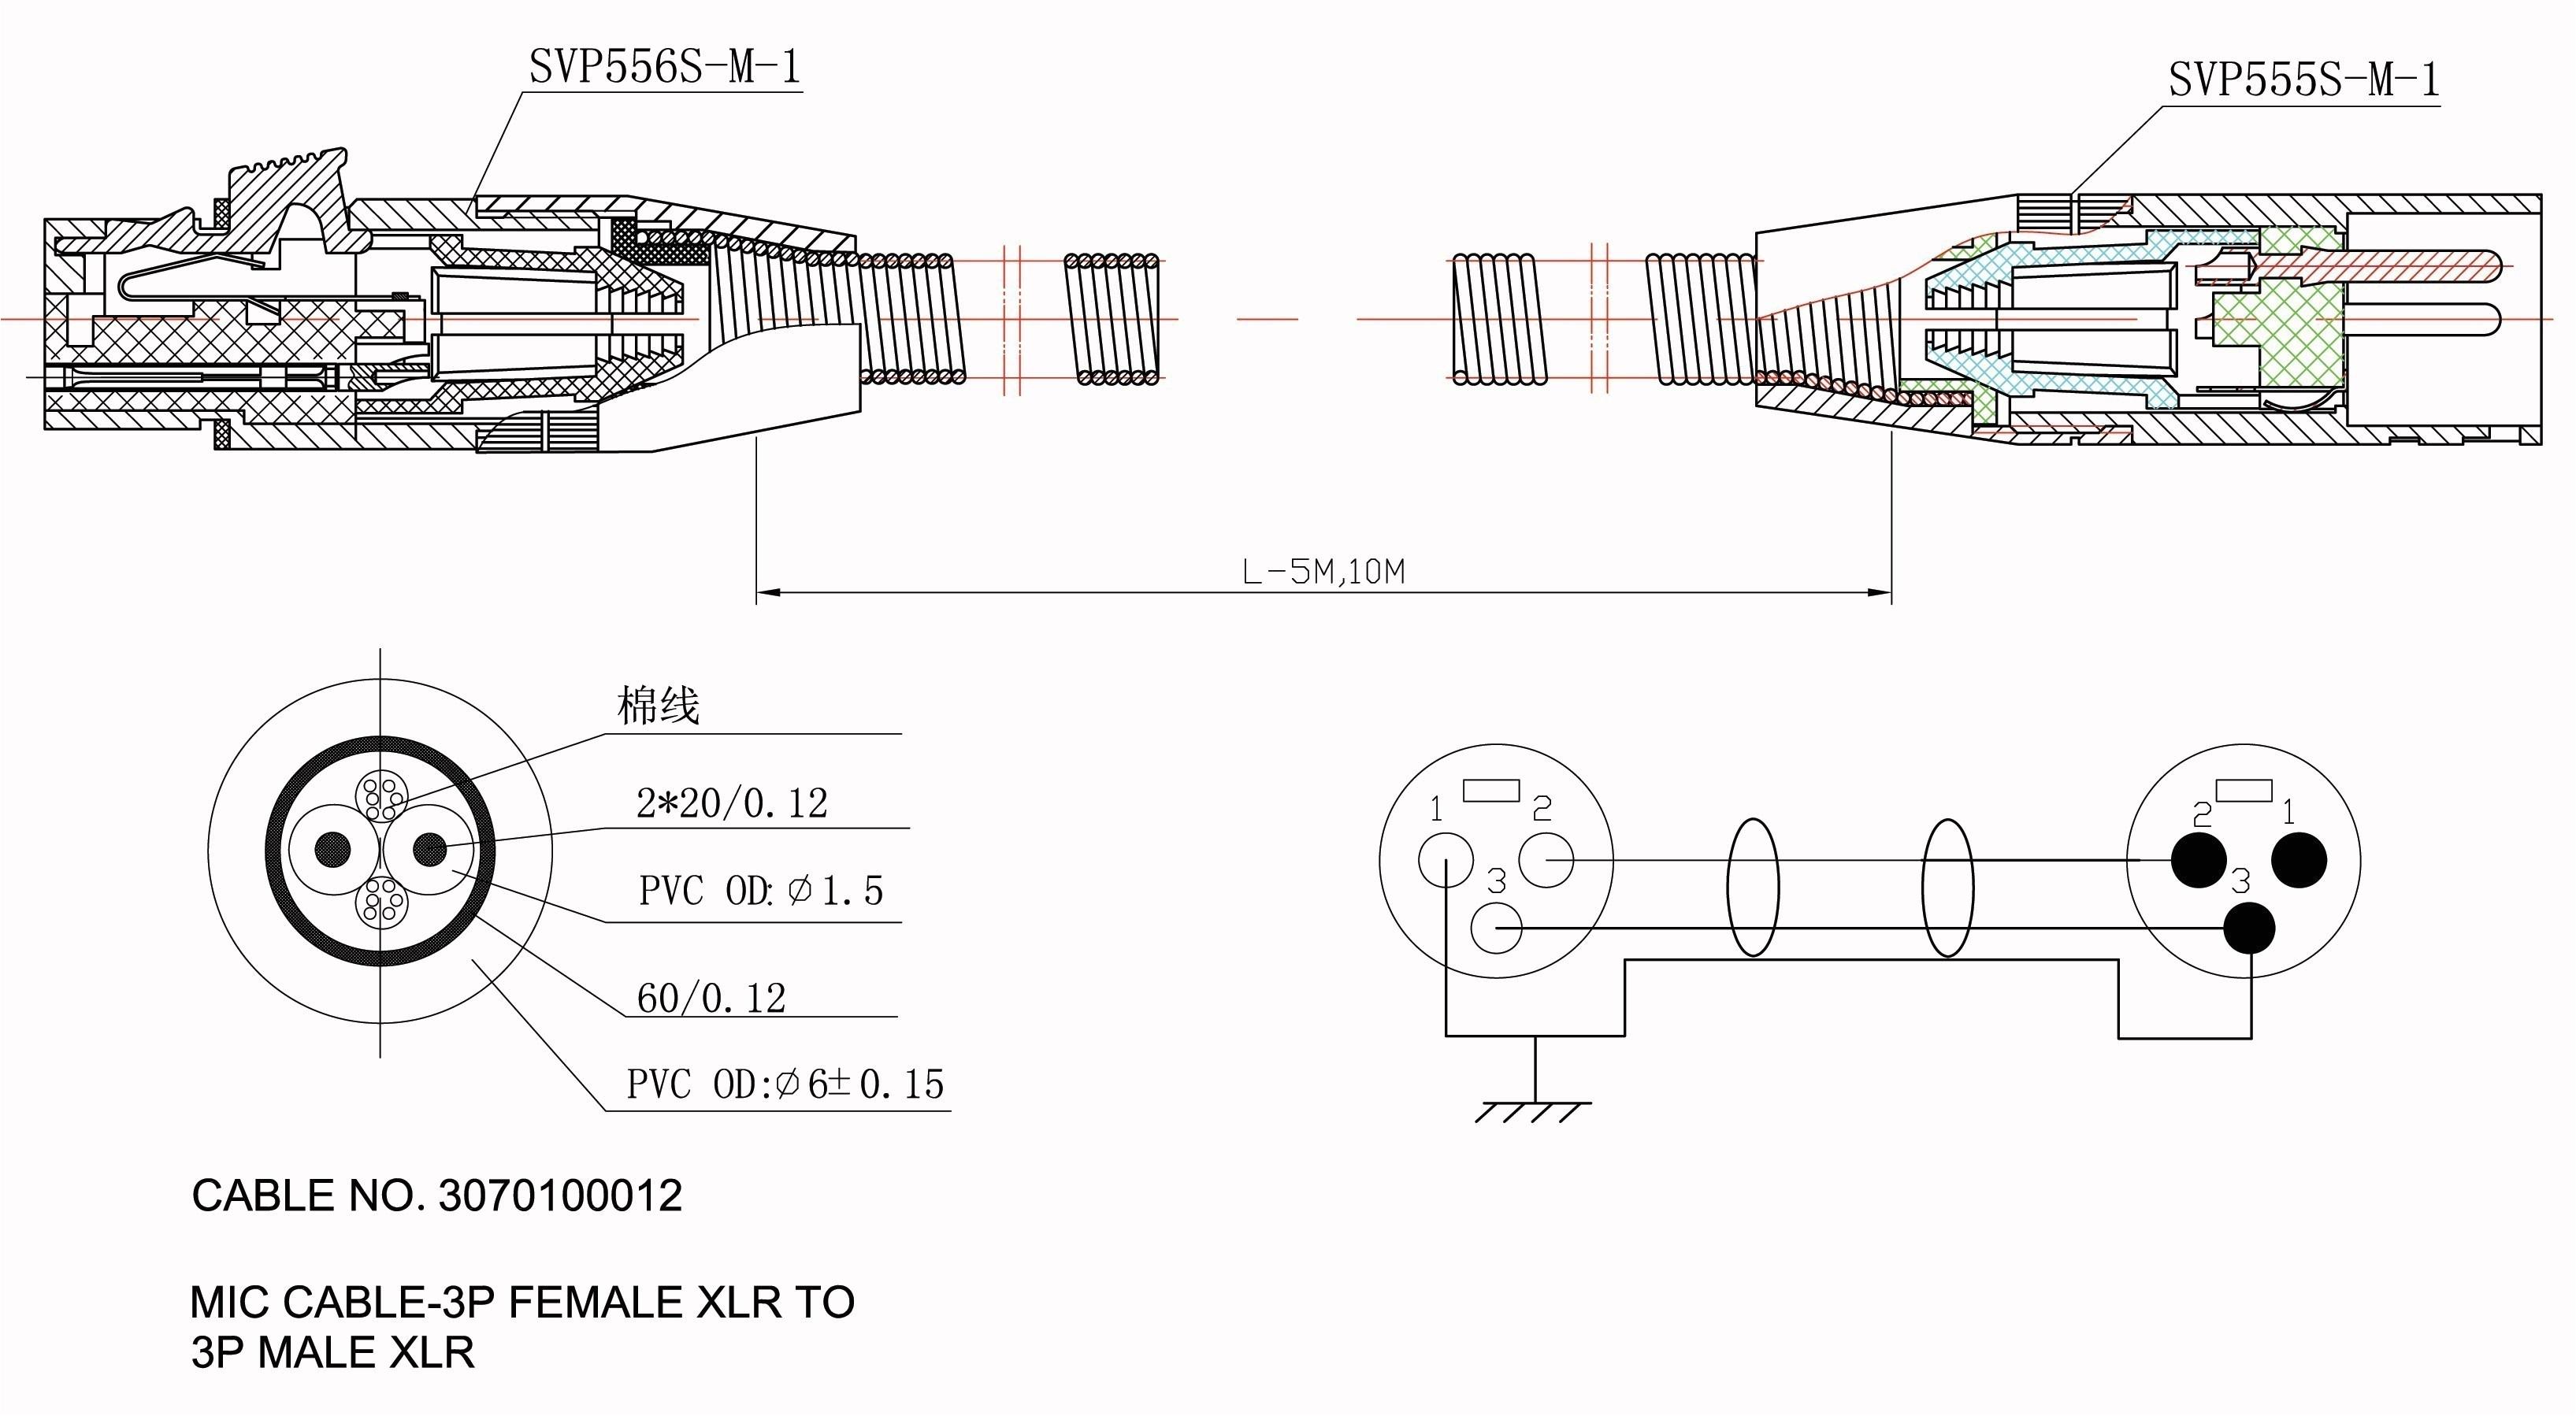 m37 wiring diagram wiring diagram review m37 alternator wiring diagram